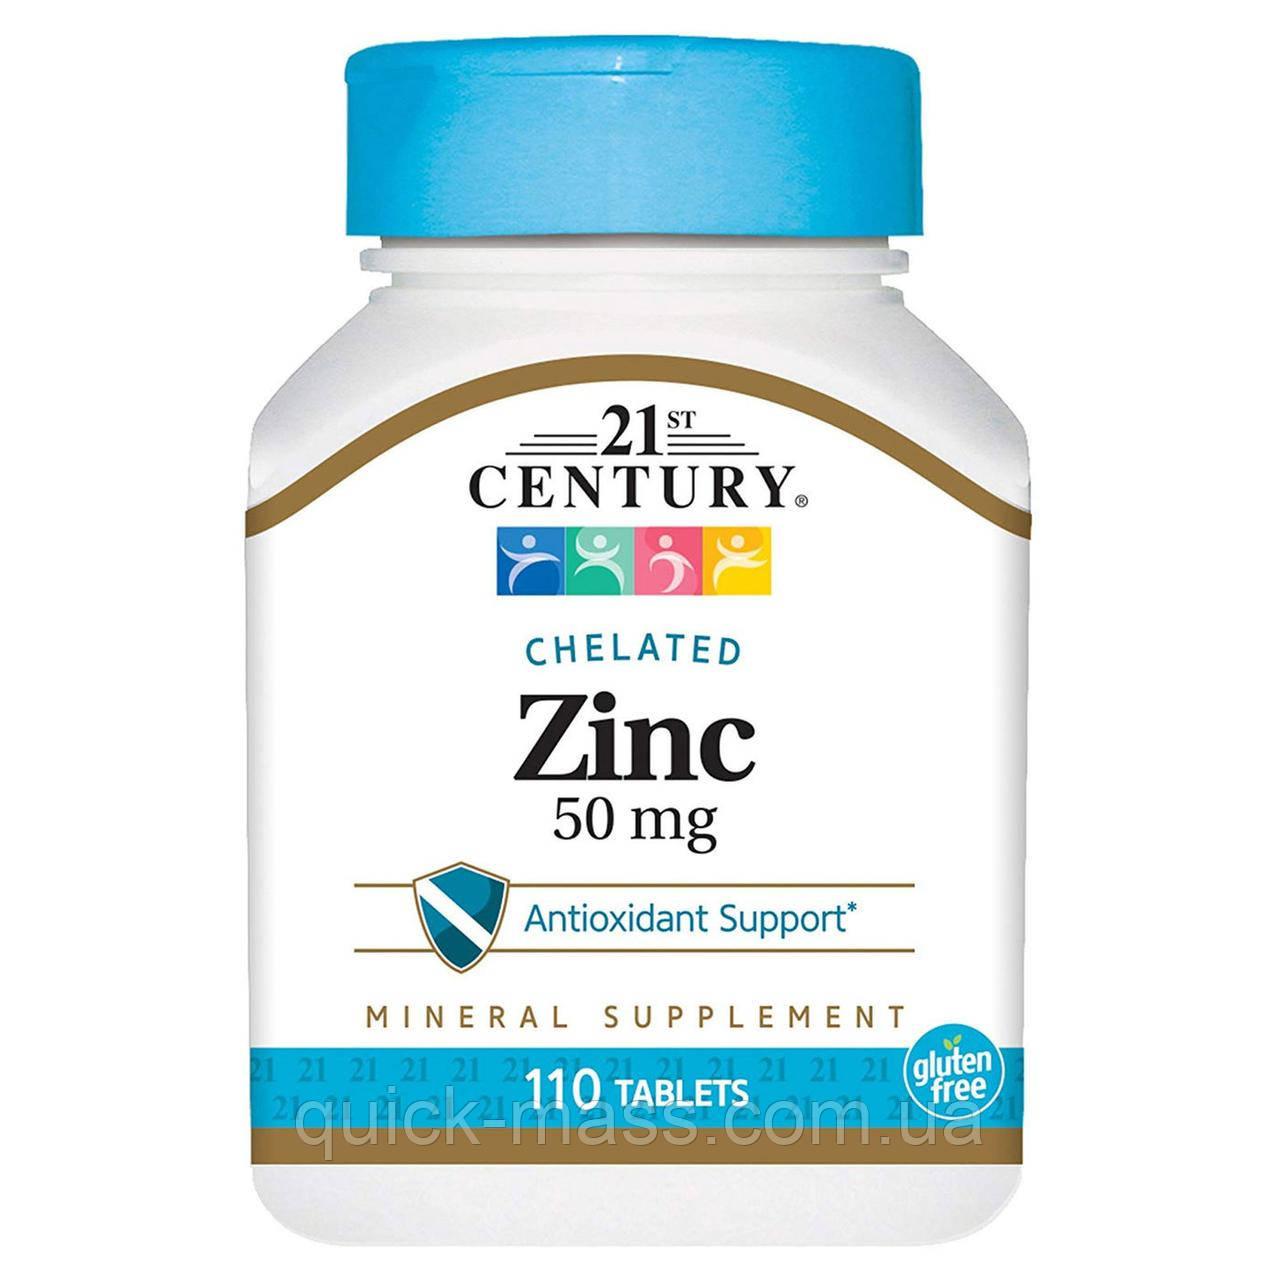 Цинк Zinc 21st Century 50 мг, 110 таблеток